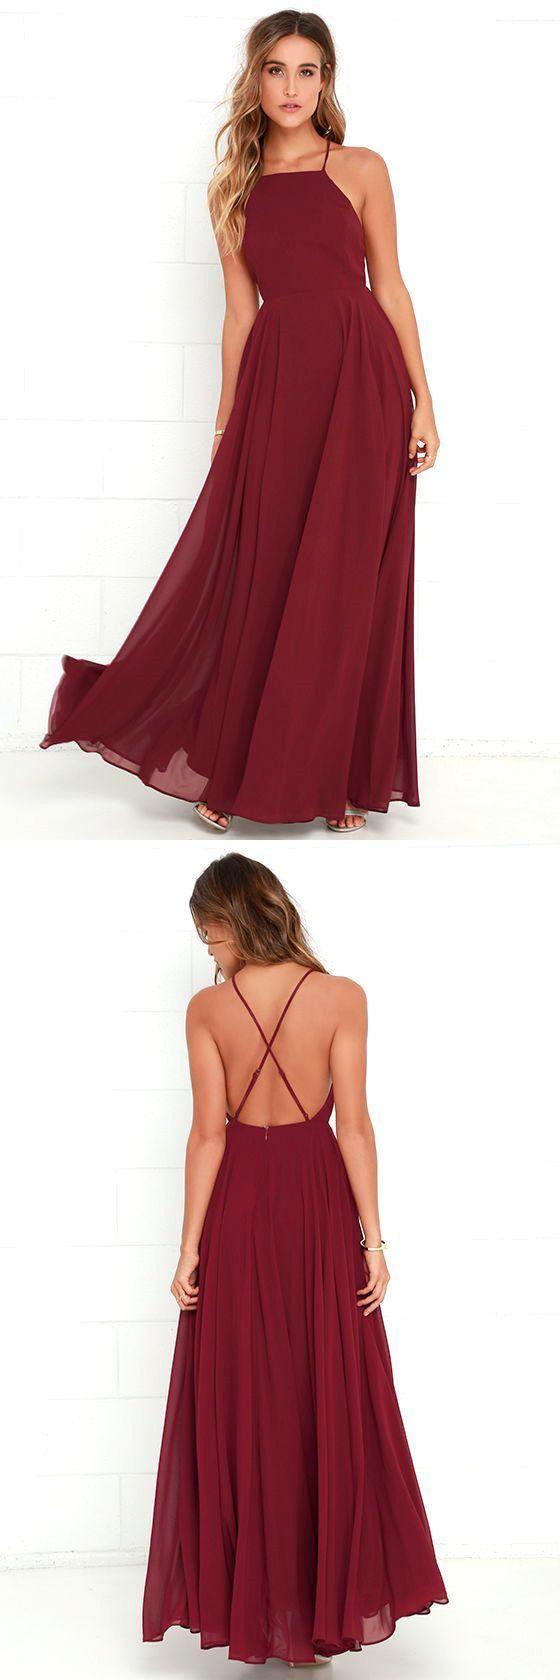 burgundy long prom dress cheap prom dress under long prom